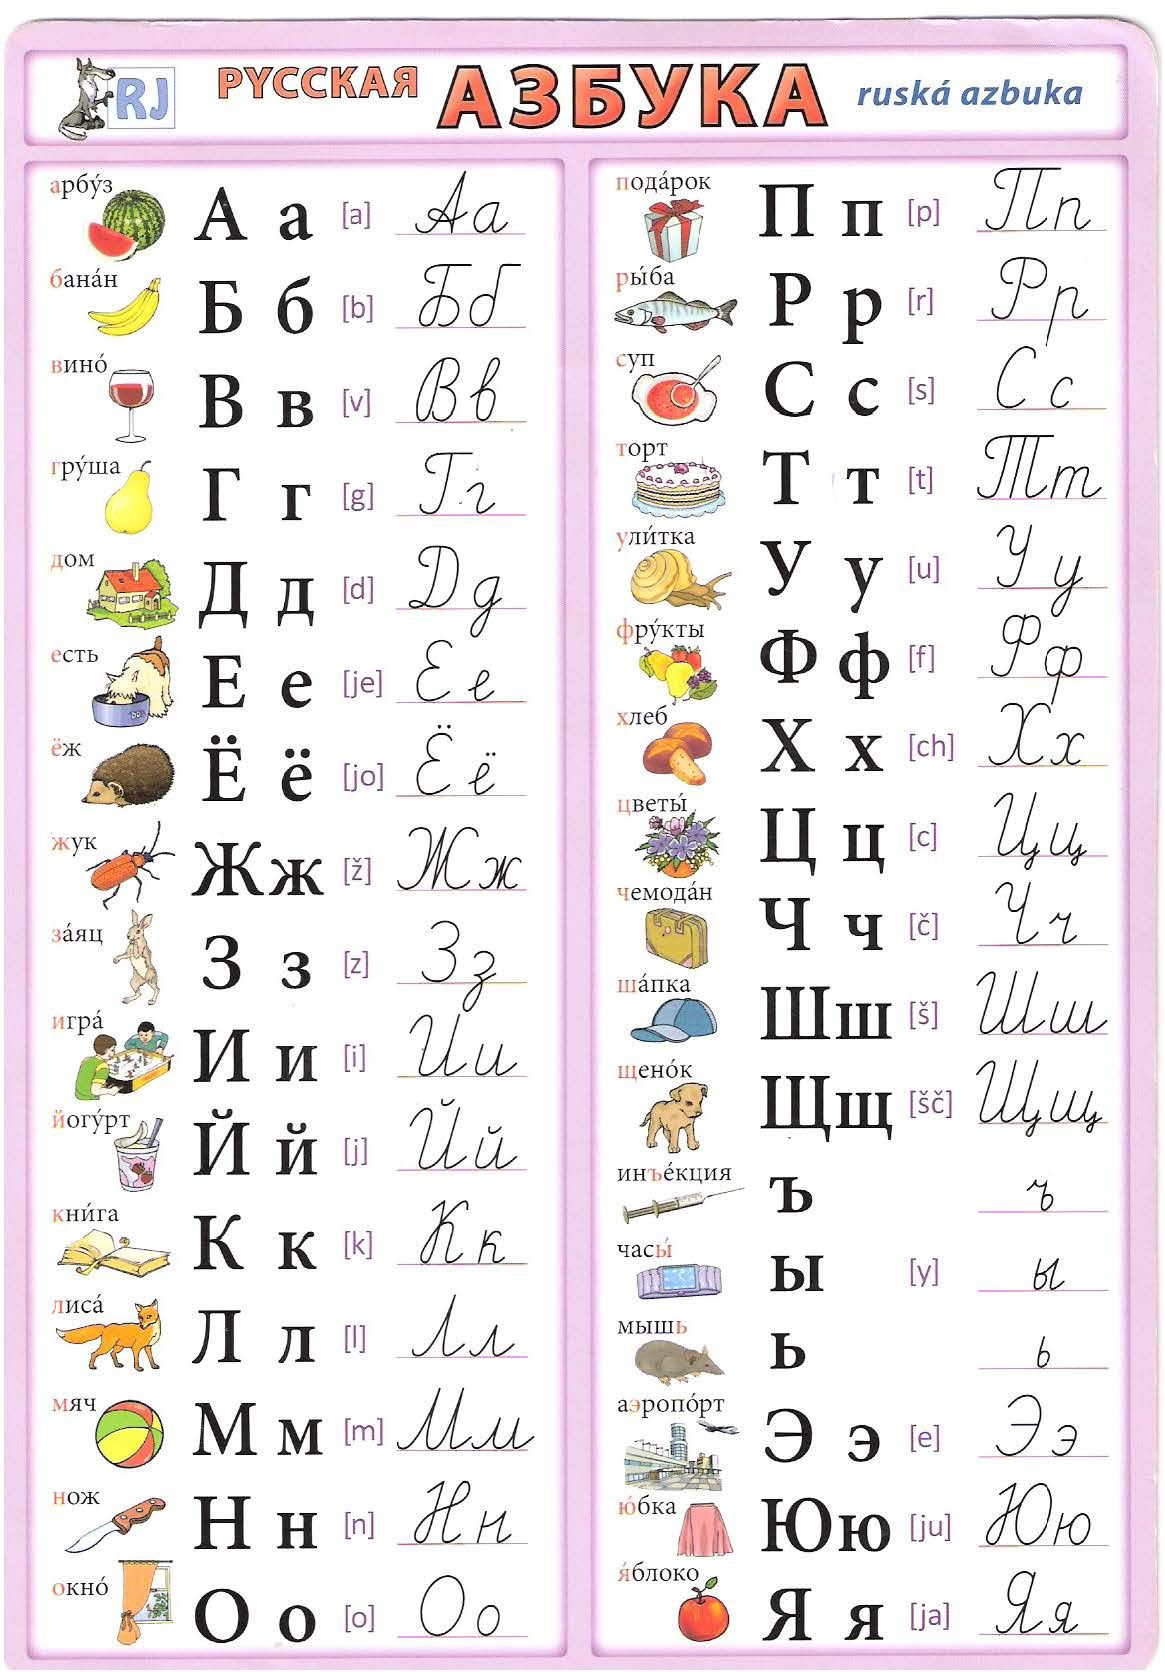 Pусский алфавит  Russian alphabet  Ruska azbuka  Руска